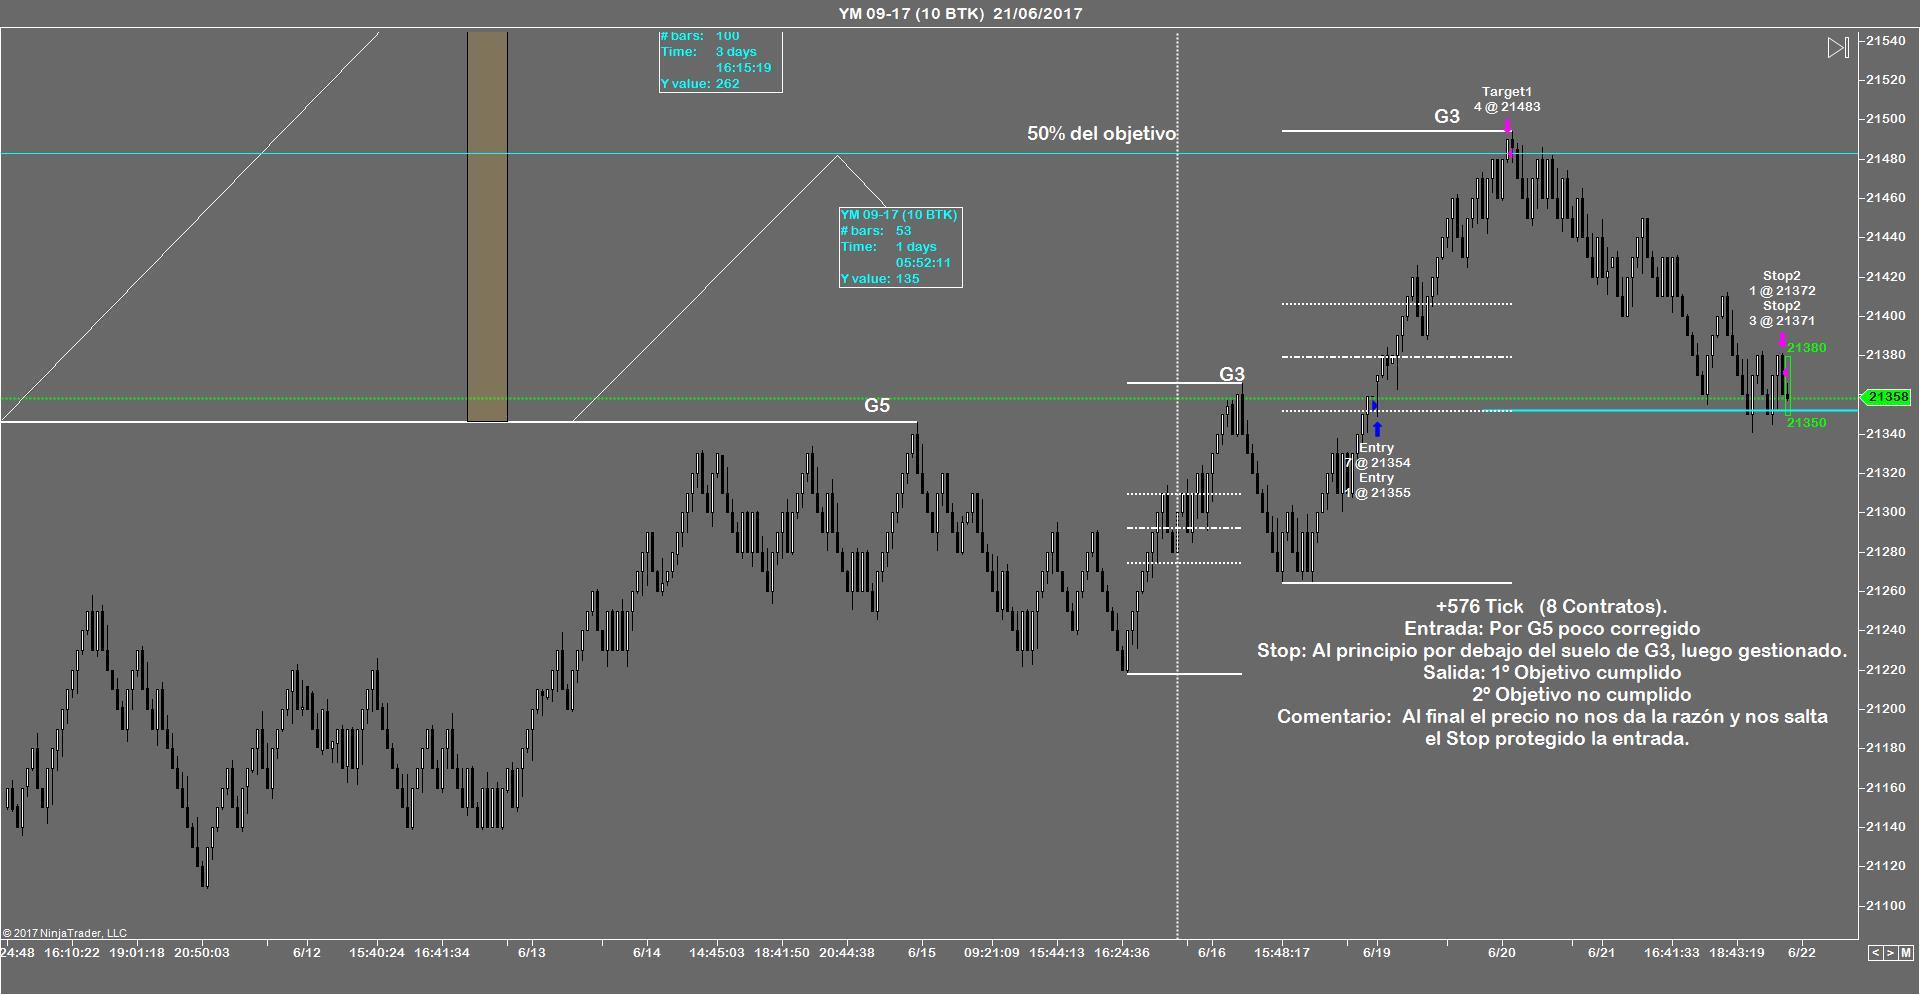 trading, futuros, forex, ninjatrader, ninjatrader brokerage, indicadores,